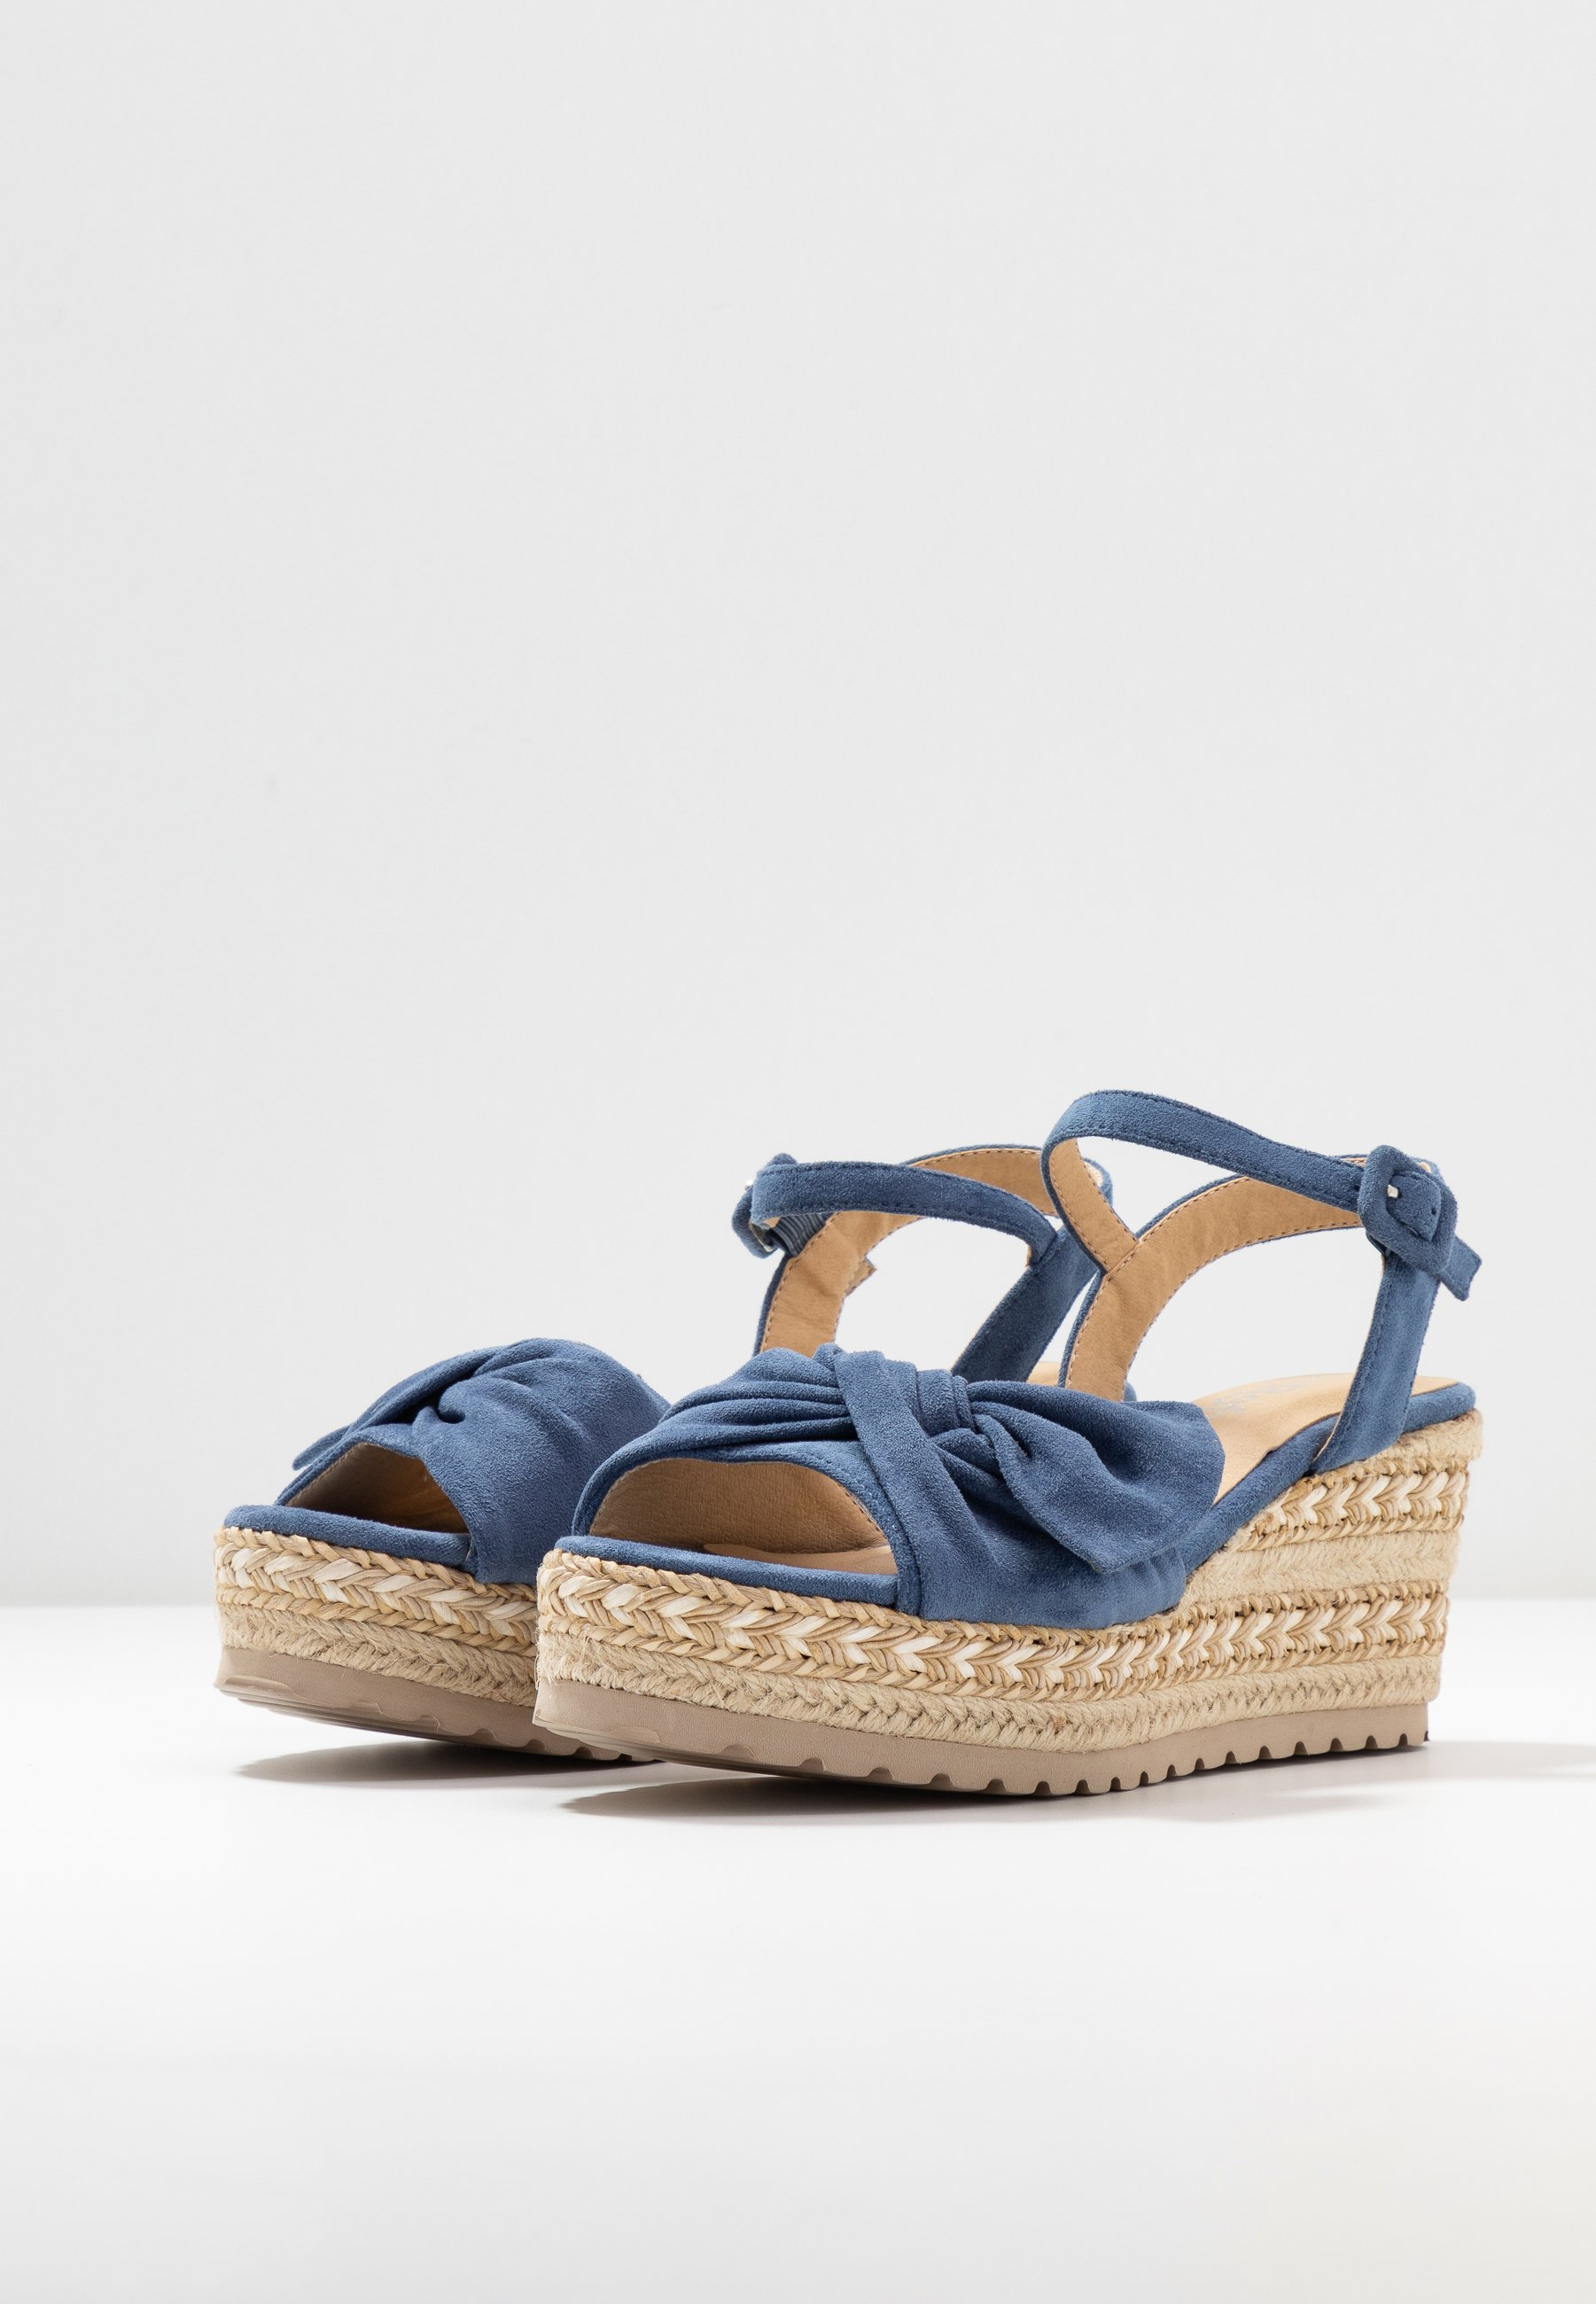 Goede deals Opruiming Refresh Sandalen met plateauzool - jeans - hR939